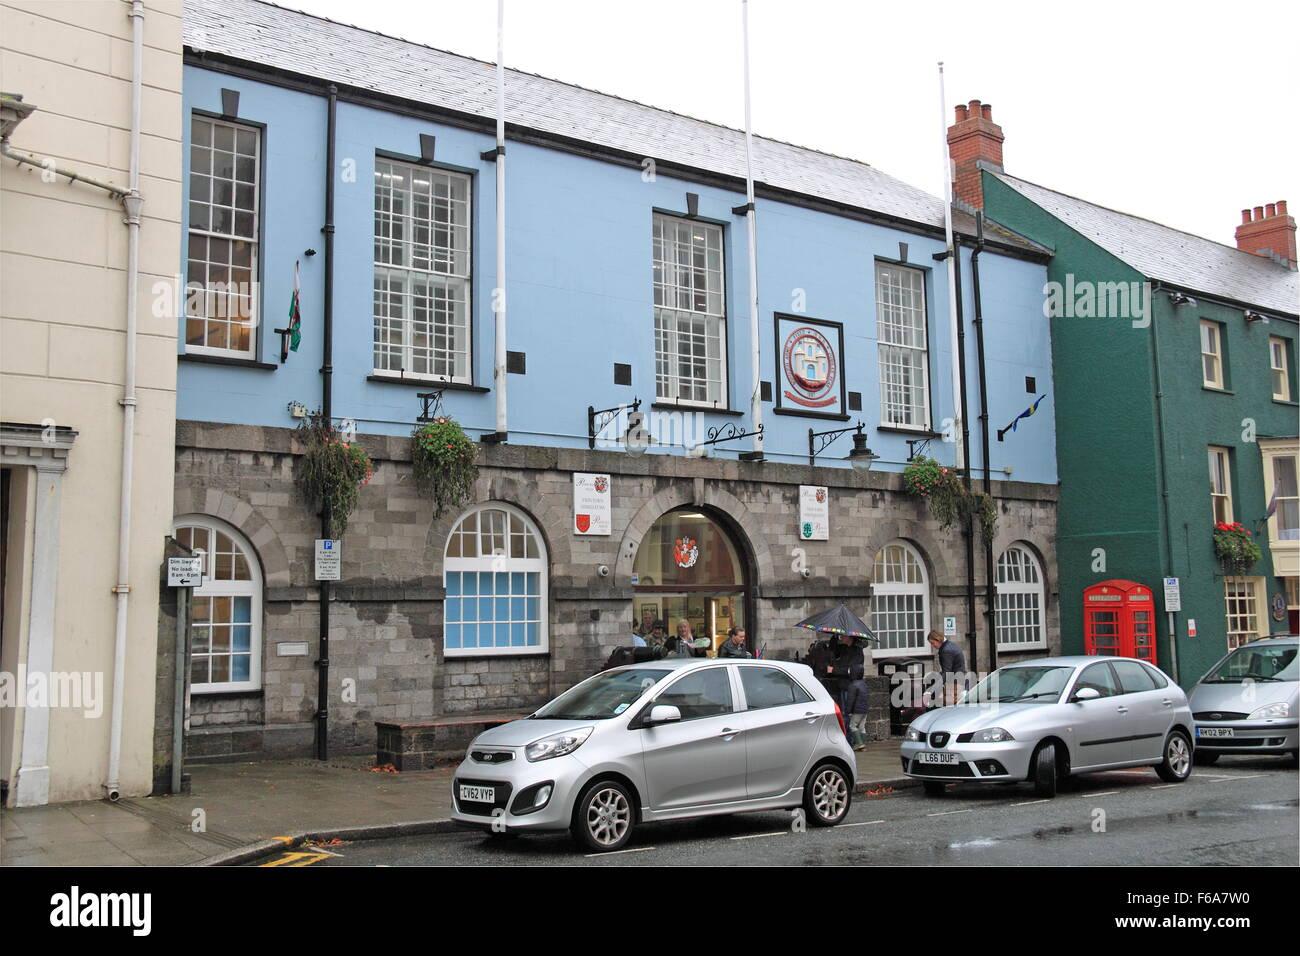 Town Hall, Main Street, Pembroke, Pembrokeshire, Dyfed, Wales, Great Britain, United Kingdom UK, Europe - Stock Image